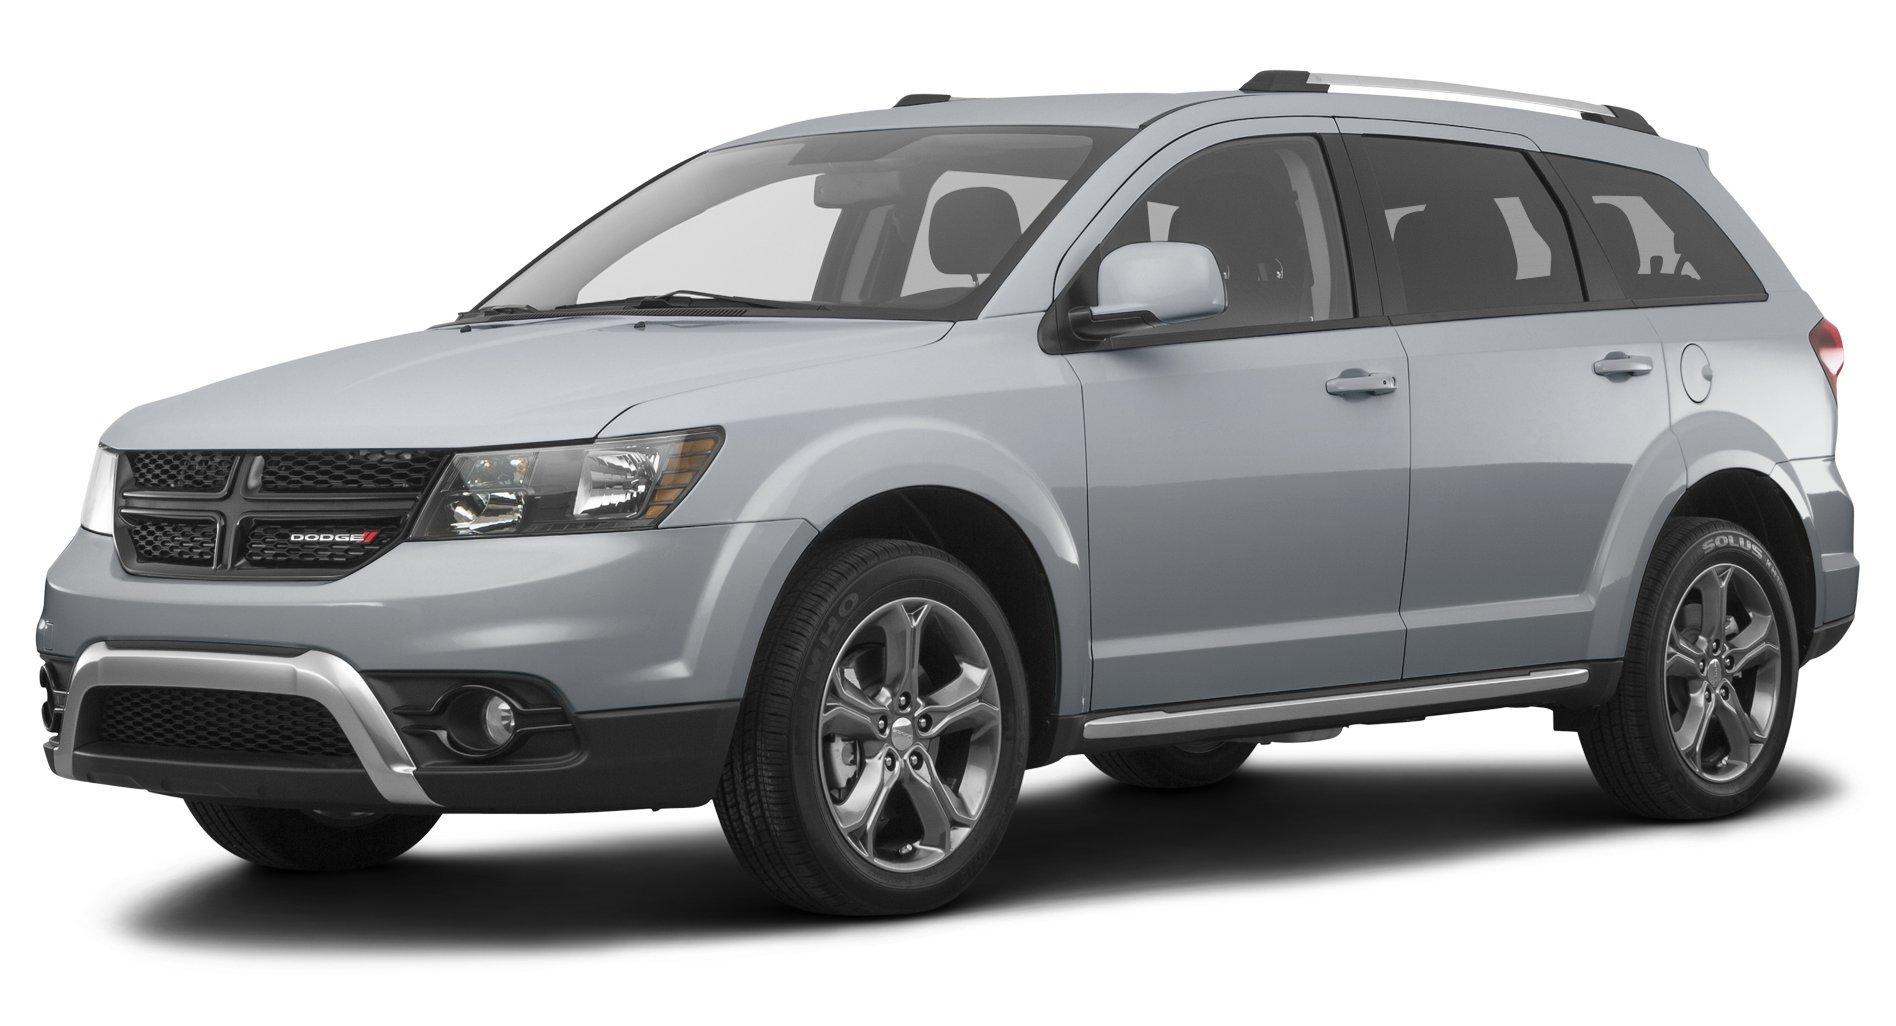 Amazon 2016 Dodge Journey Reviews and Specs Vehicles